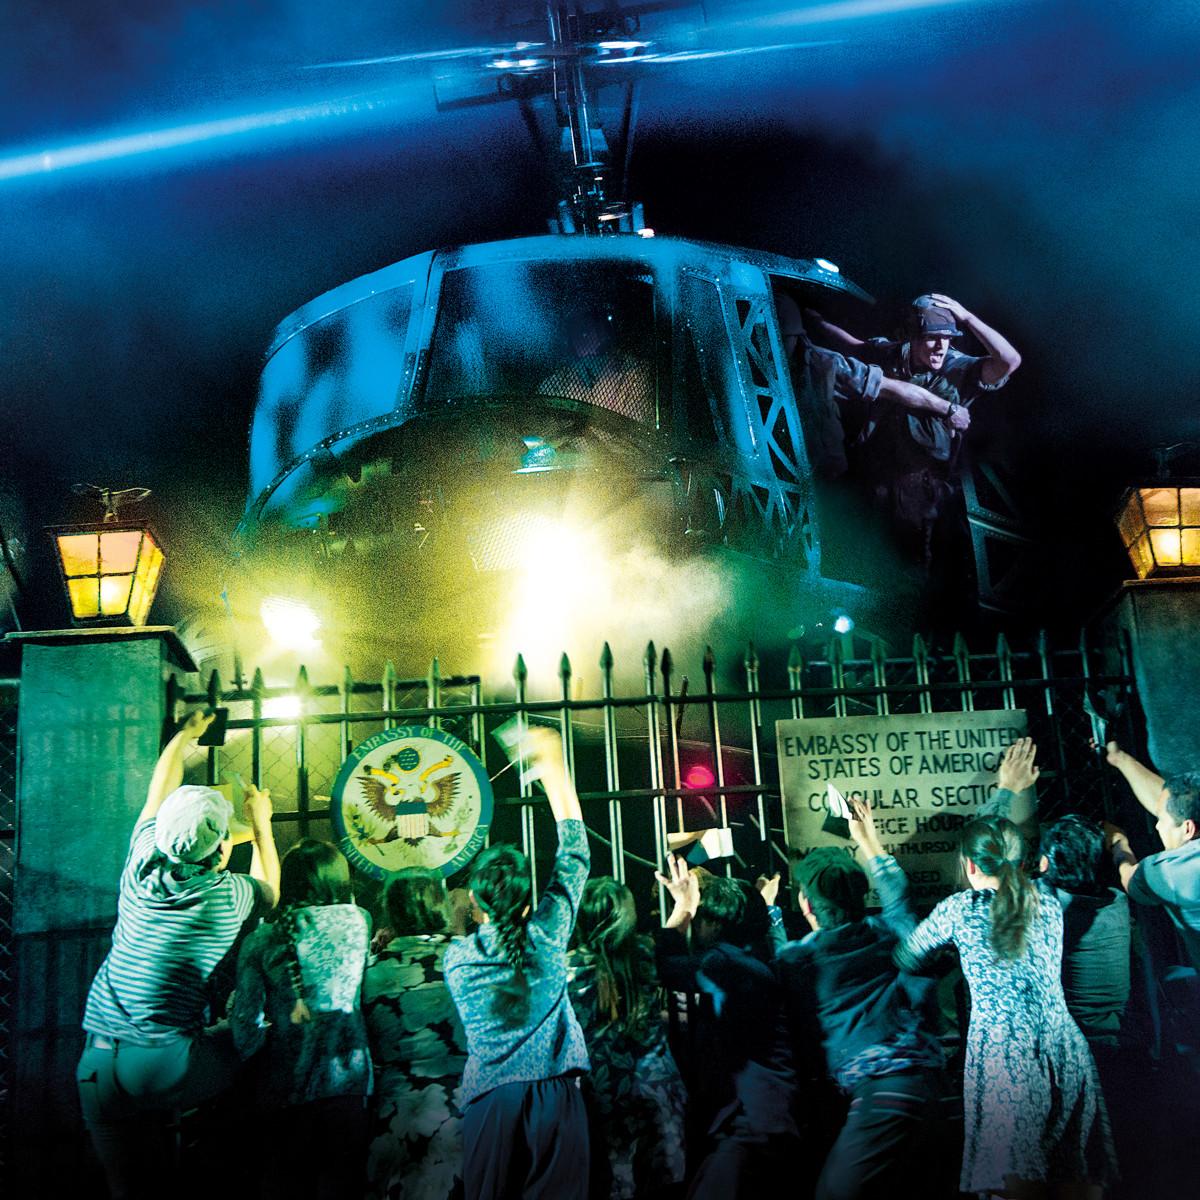 Miss Saigon tour-helicopter lands